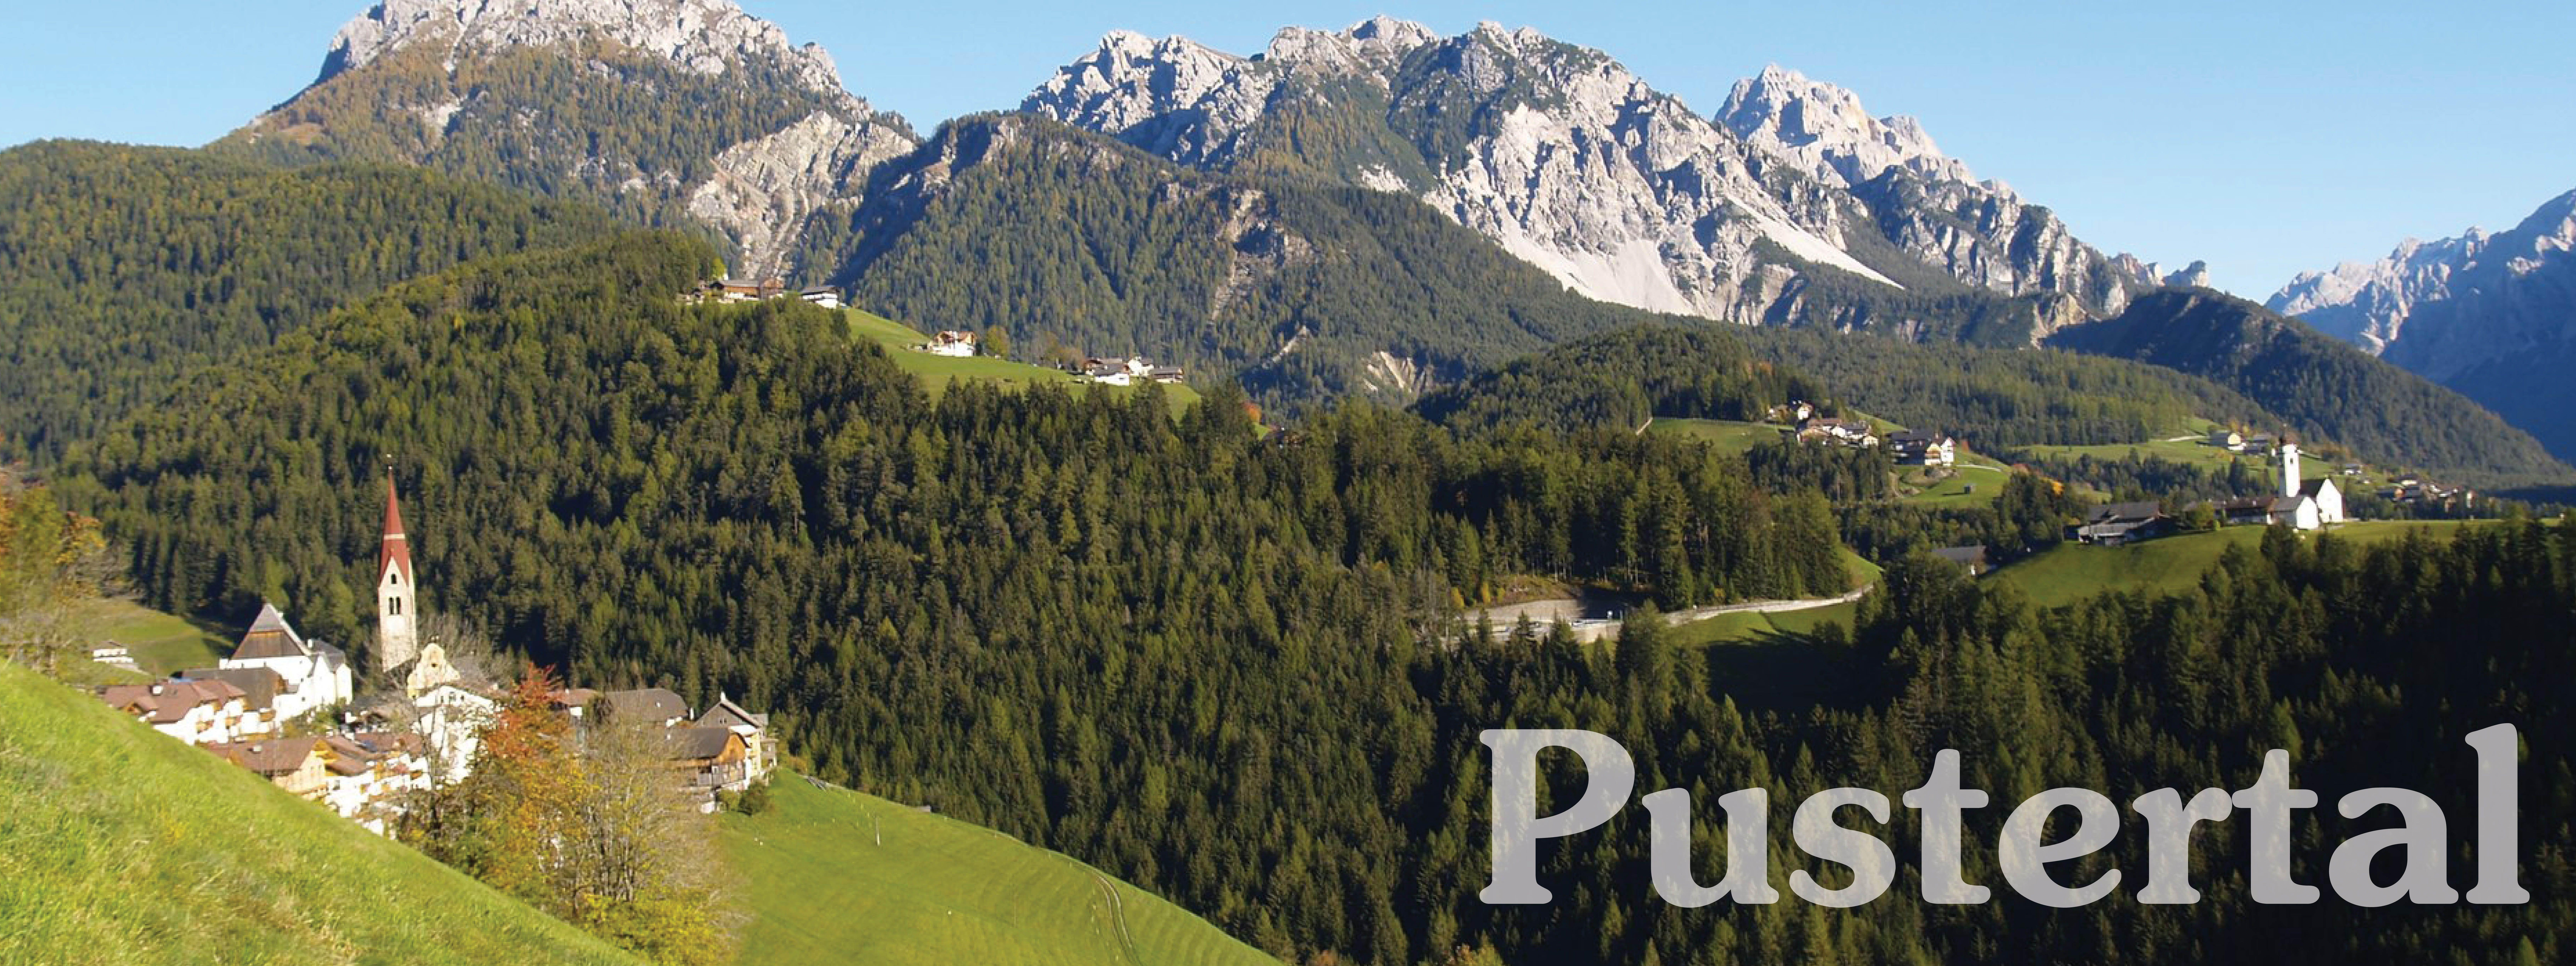 Pustertal_Landschaft.jpg